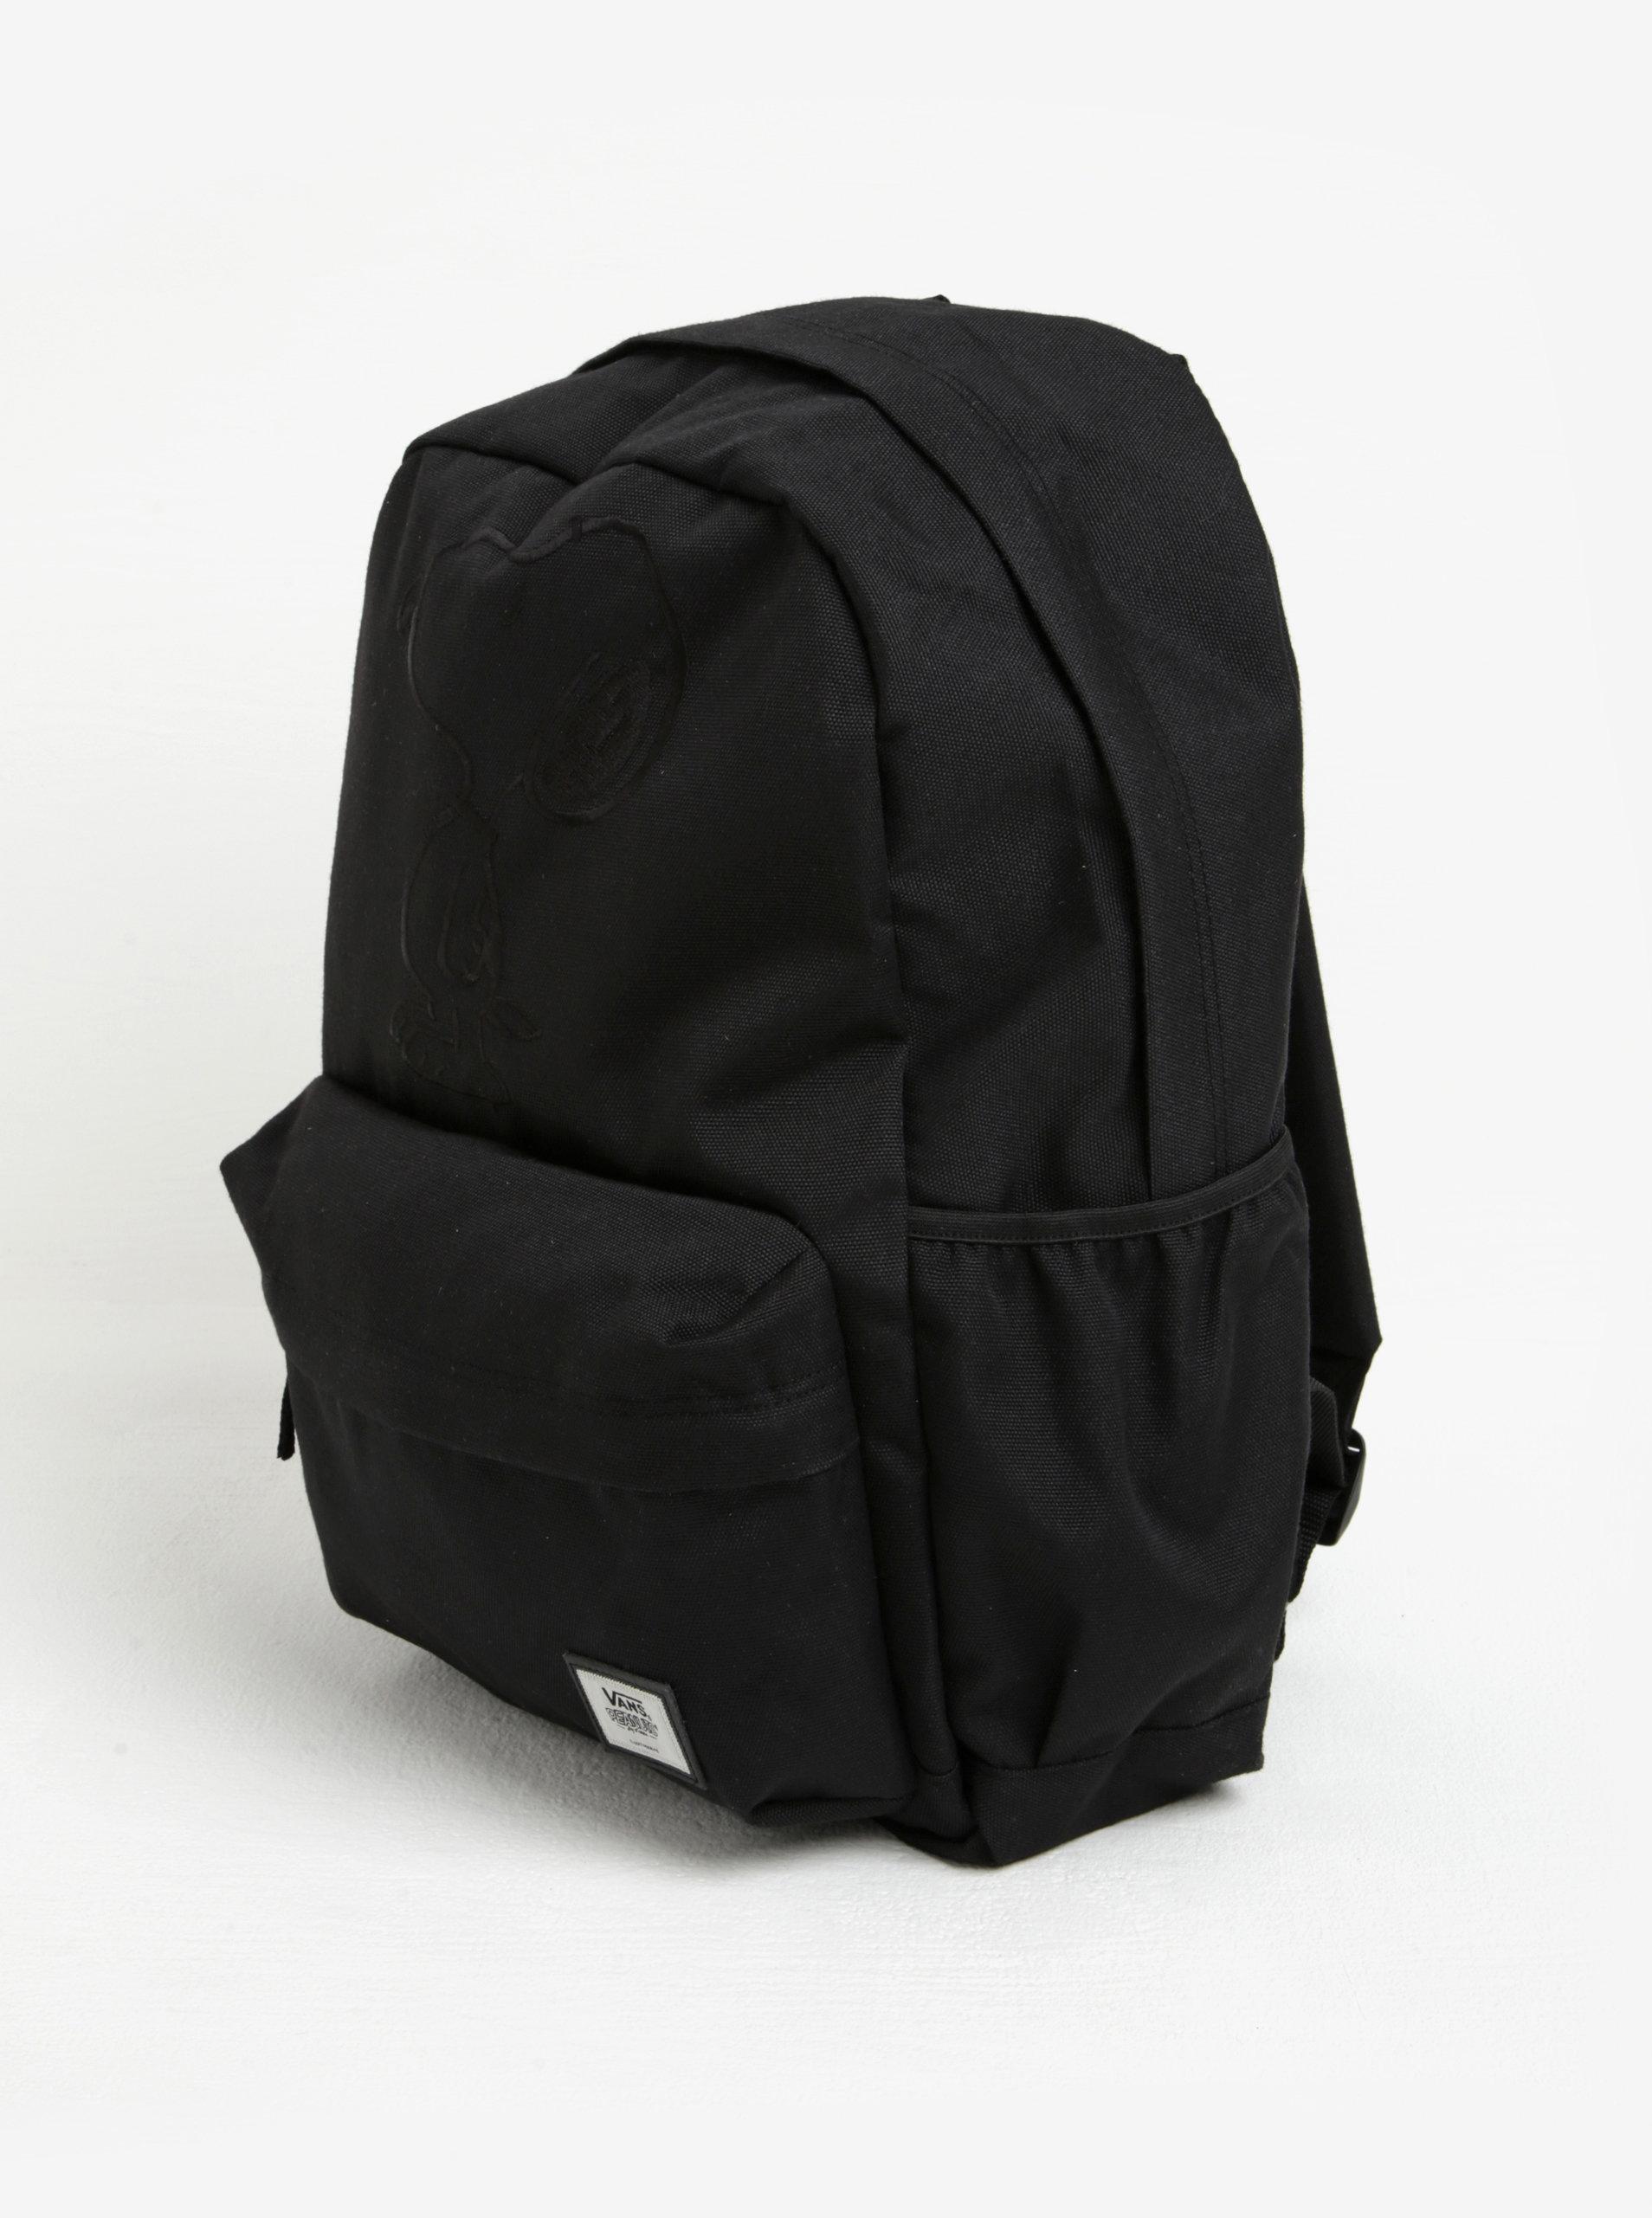 69db88cd695 Černý batoh s výšivkou Vans Peanuts ...